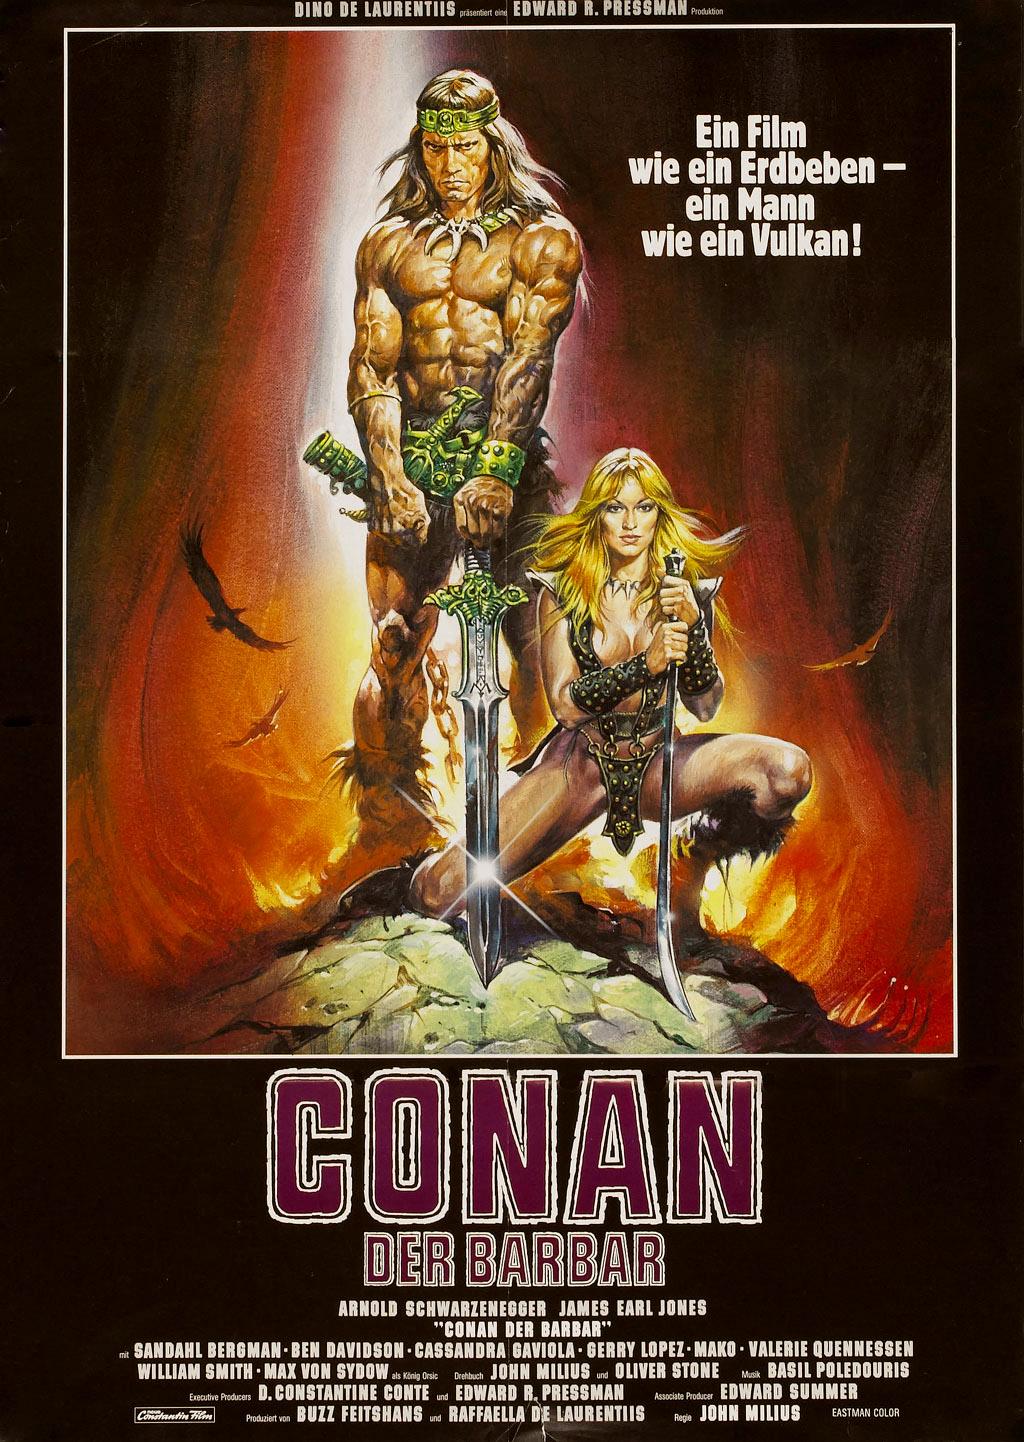 Conan-der-Barbar-1982-Film